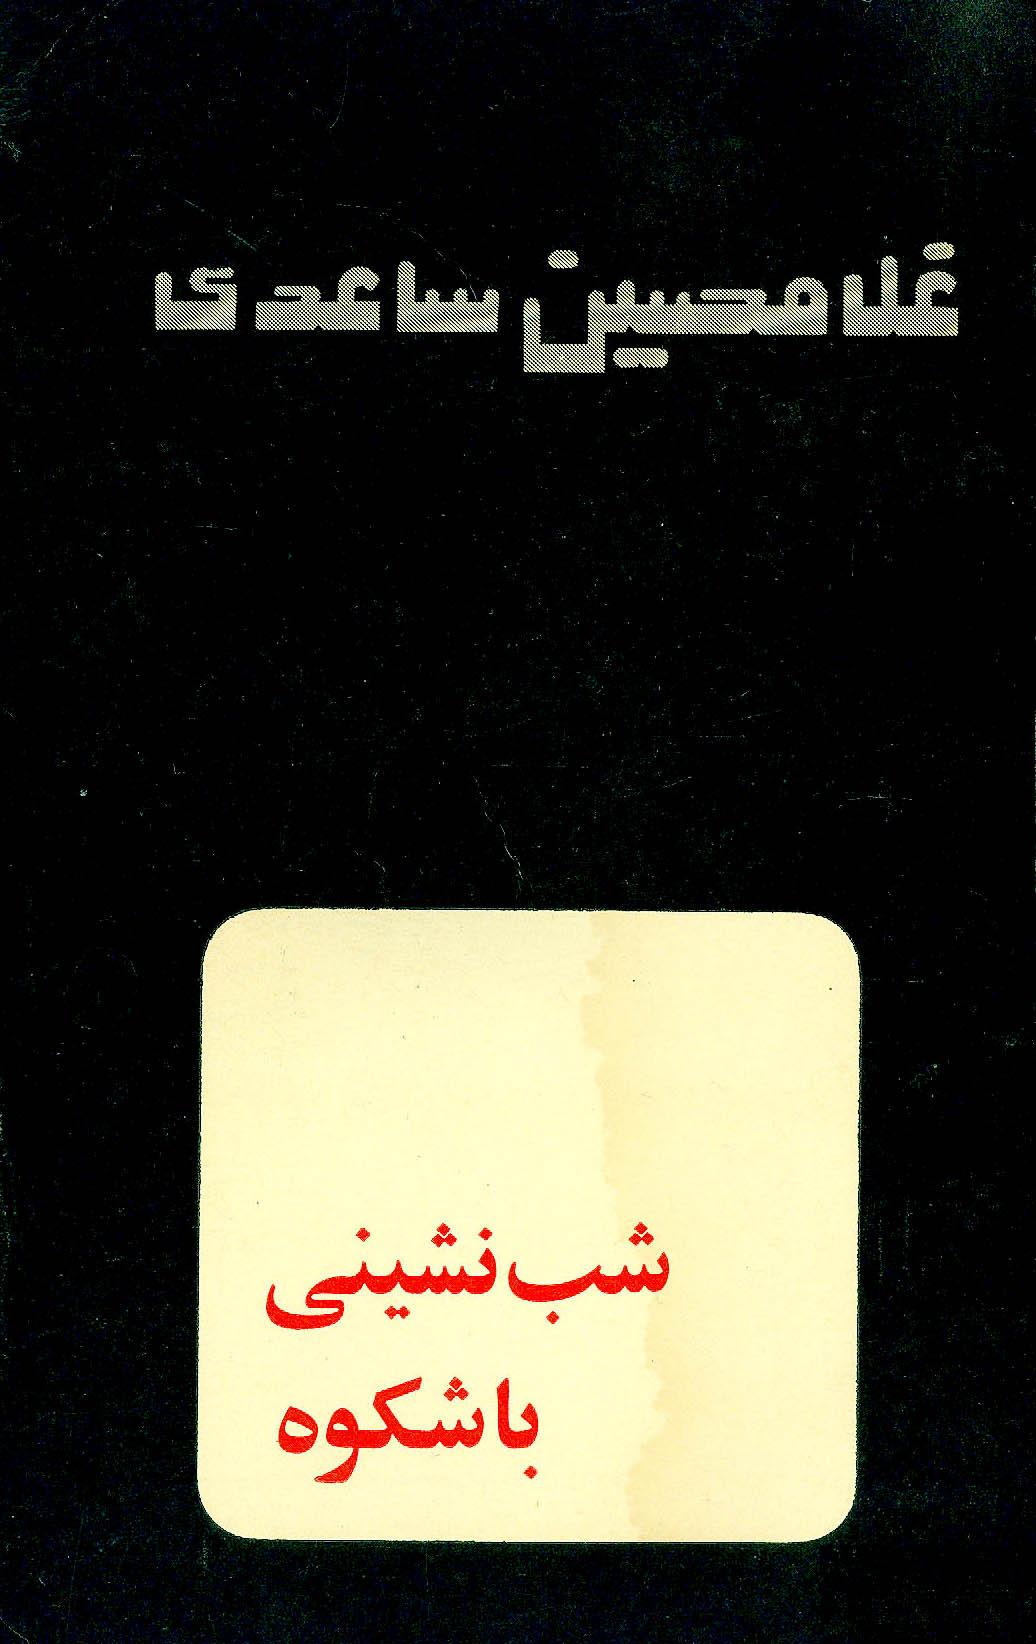 Saedi gholam hosayn encyclopaedia iranica figure 2 buycottarizona